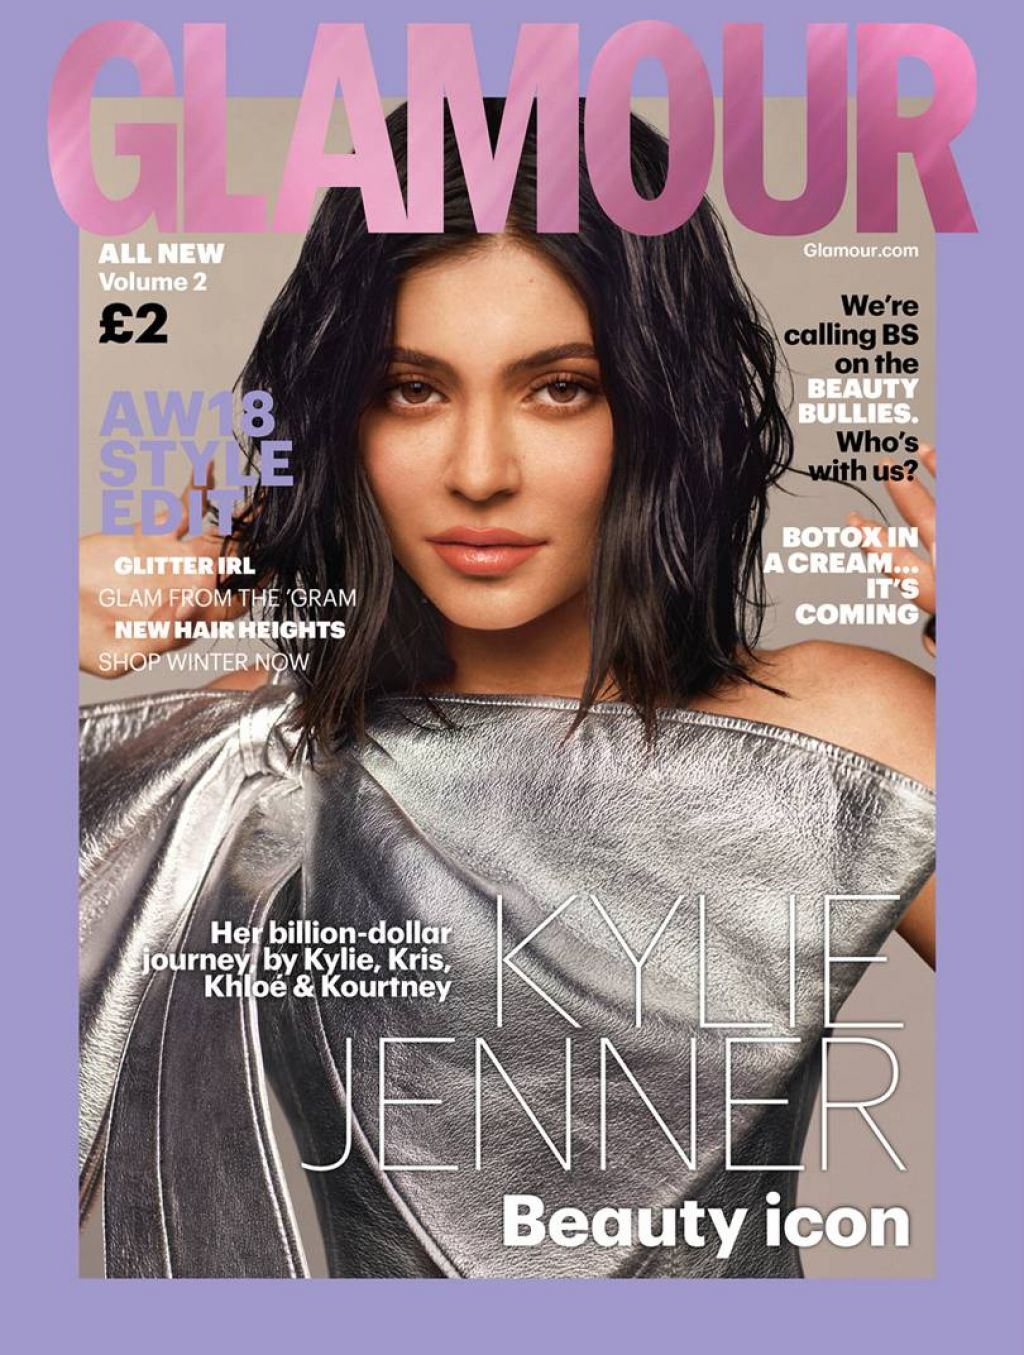 Kylie Jenner - Glamour Magazine UK Autumn/Winter 2018